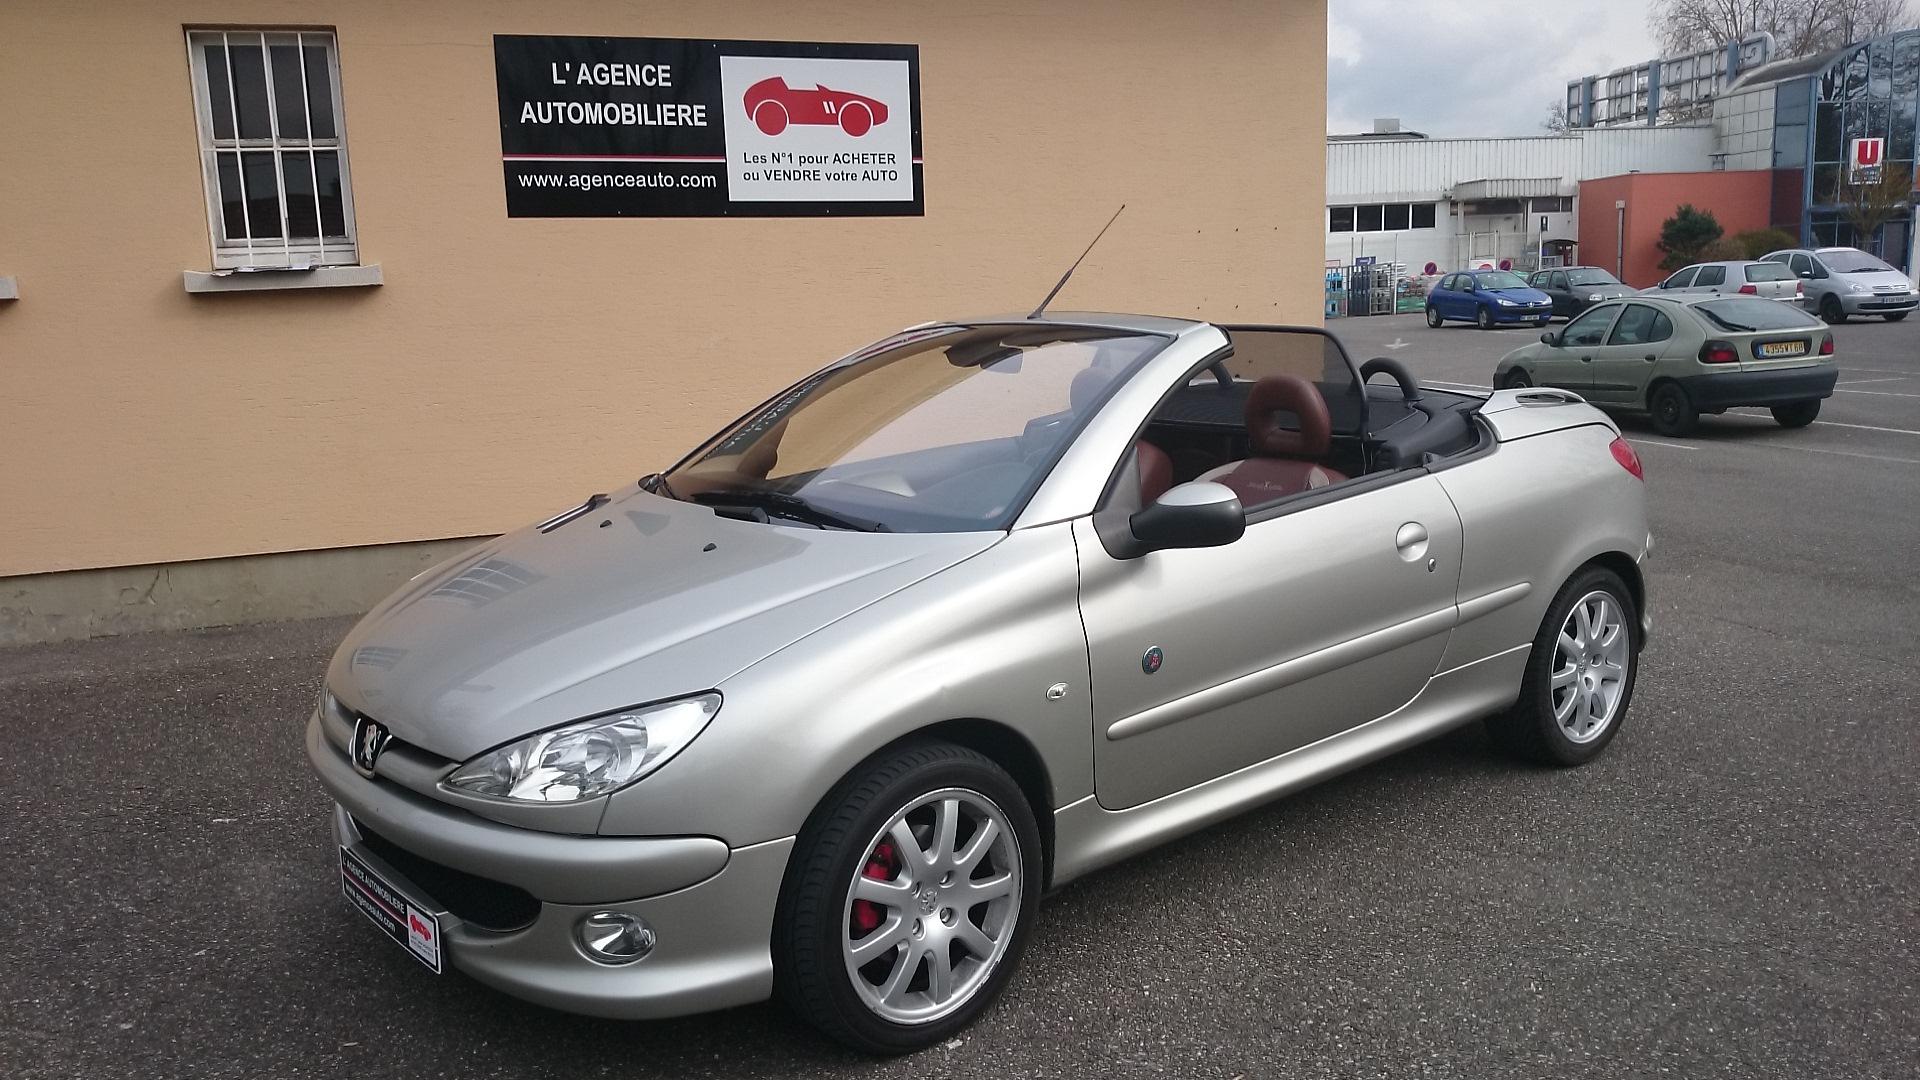 Peugeot 206 cc 1.6 HDi 110 Roland Garros occasion Mulhouse pas cher ...